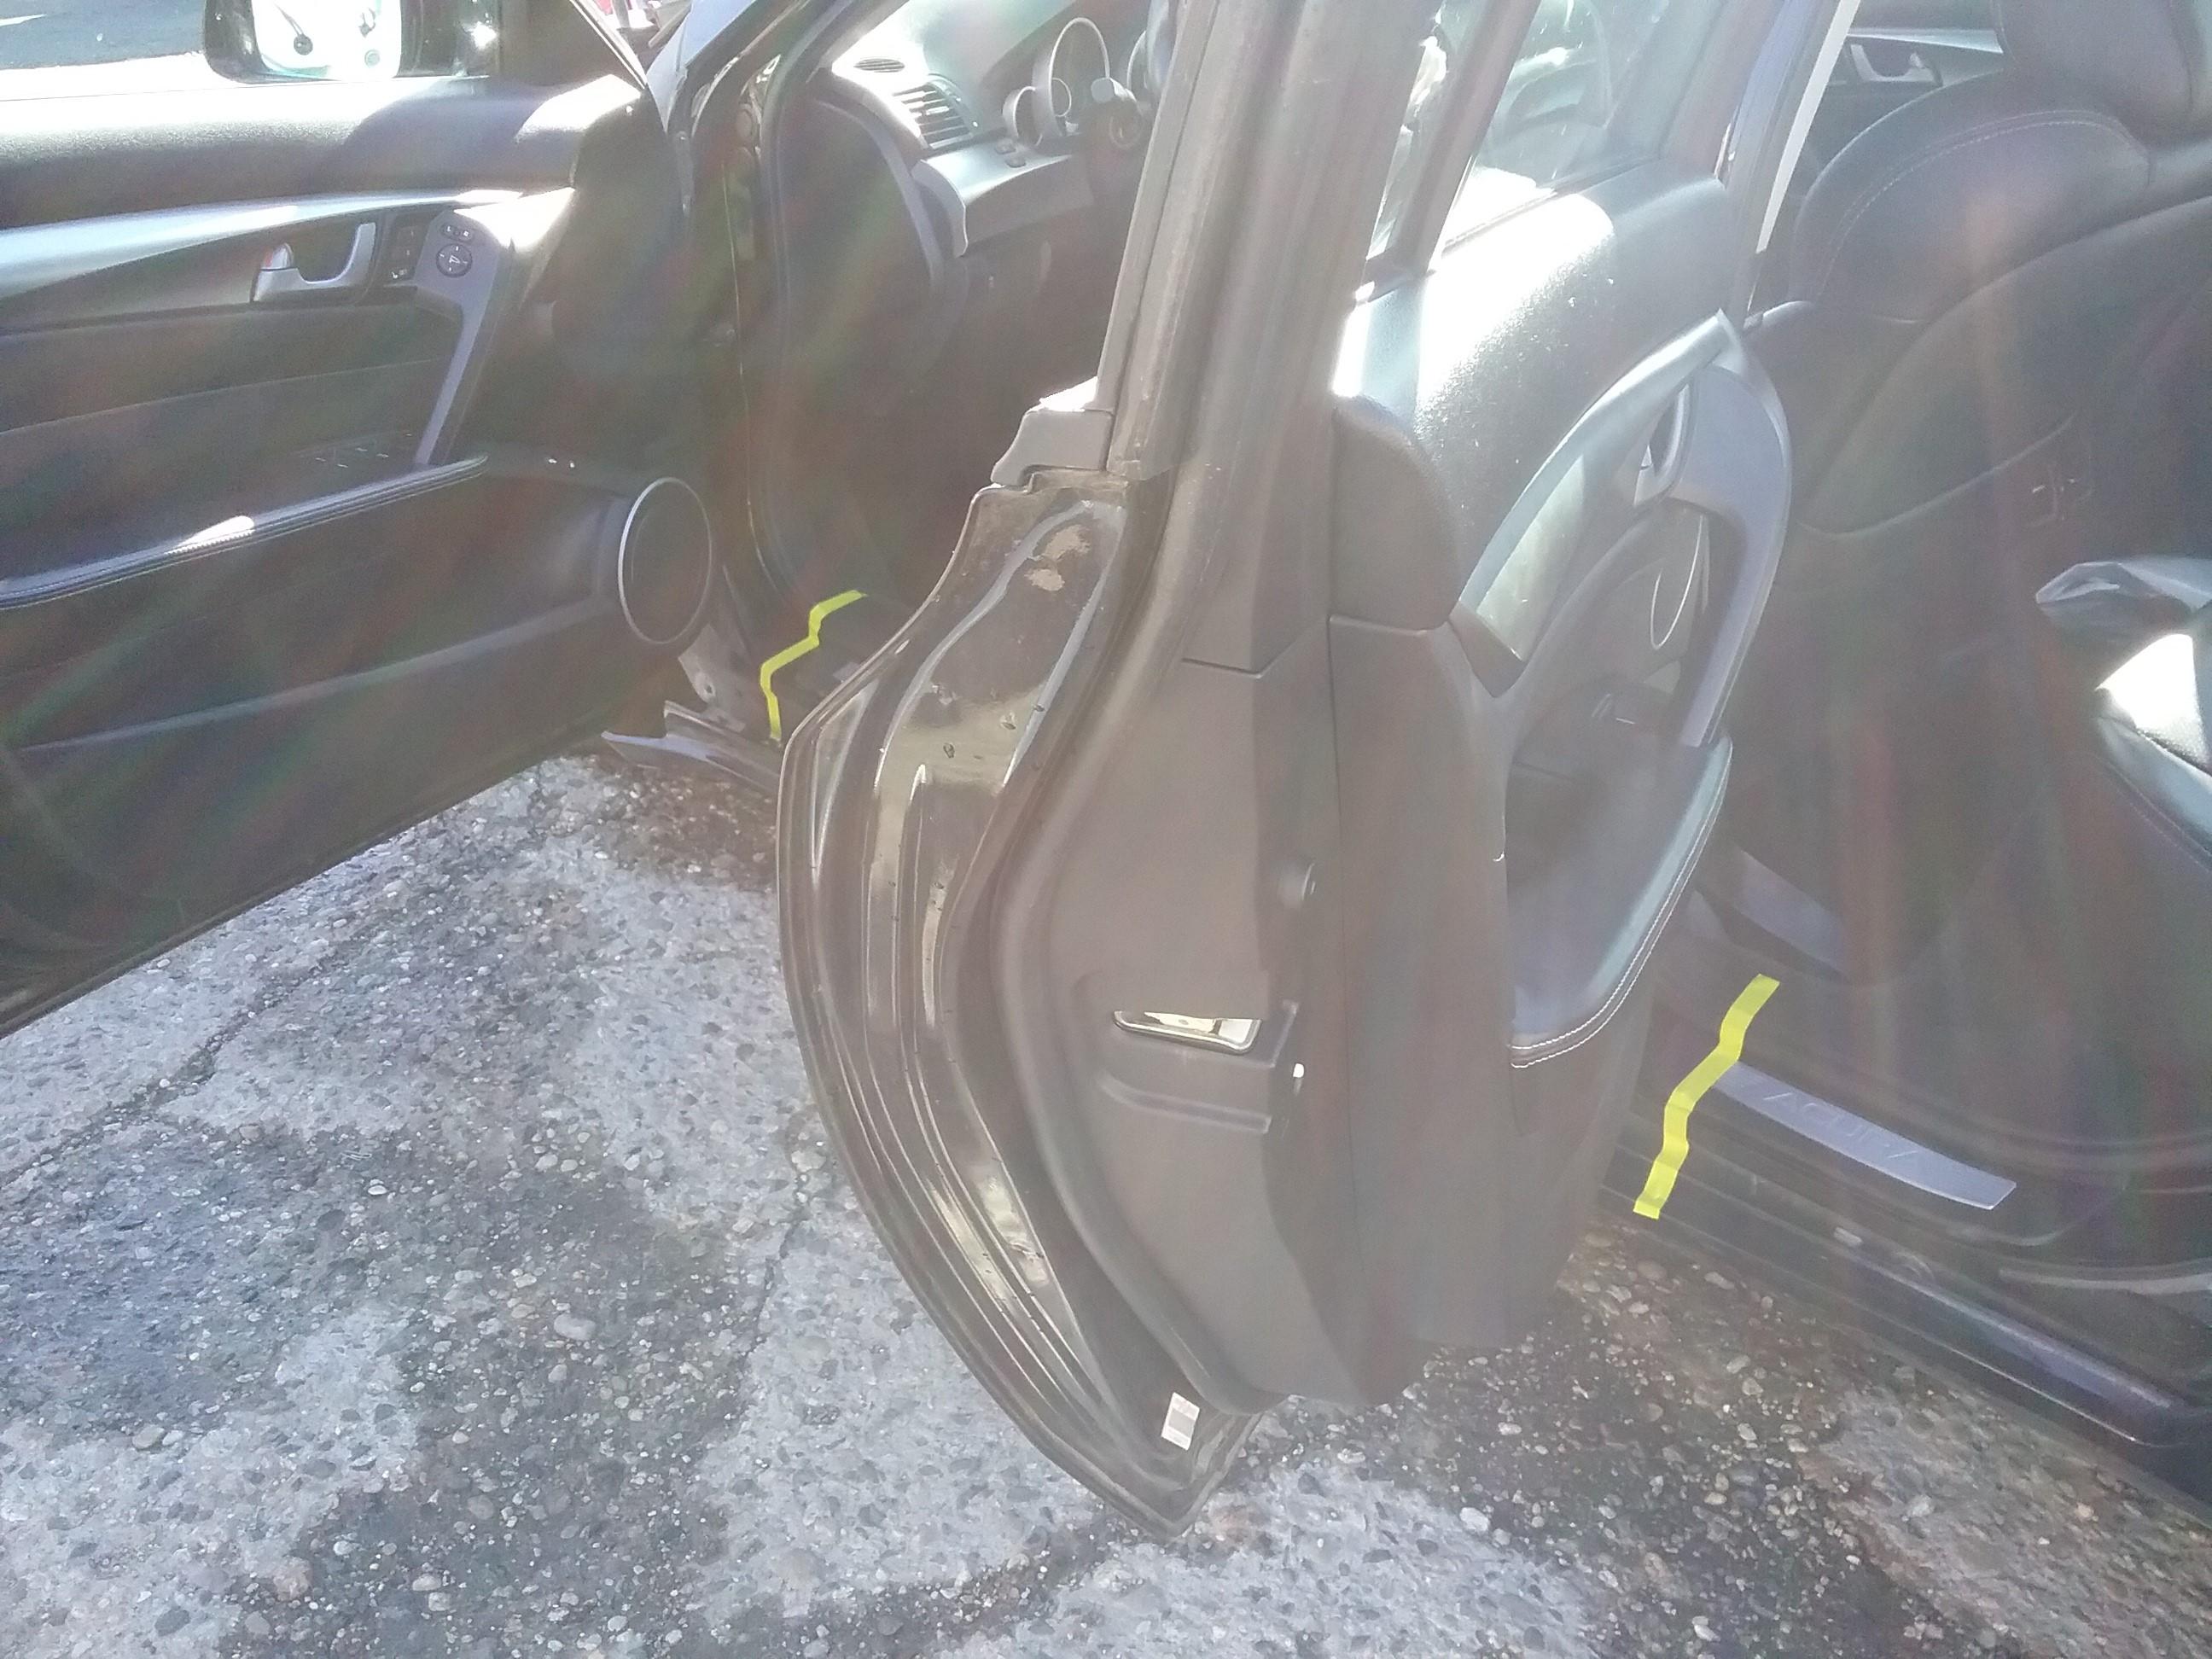 2010 Acura TL SH AWD Stock B004 – A Plus Auto Salvage